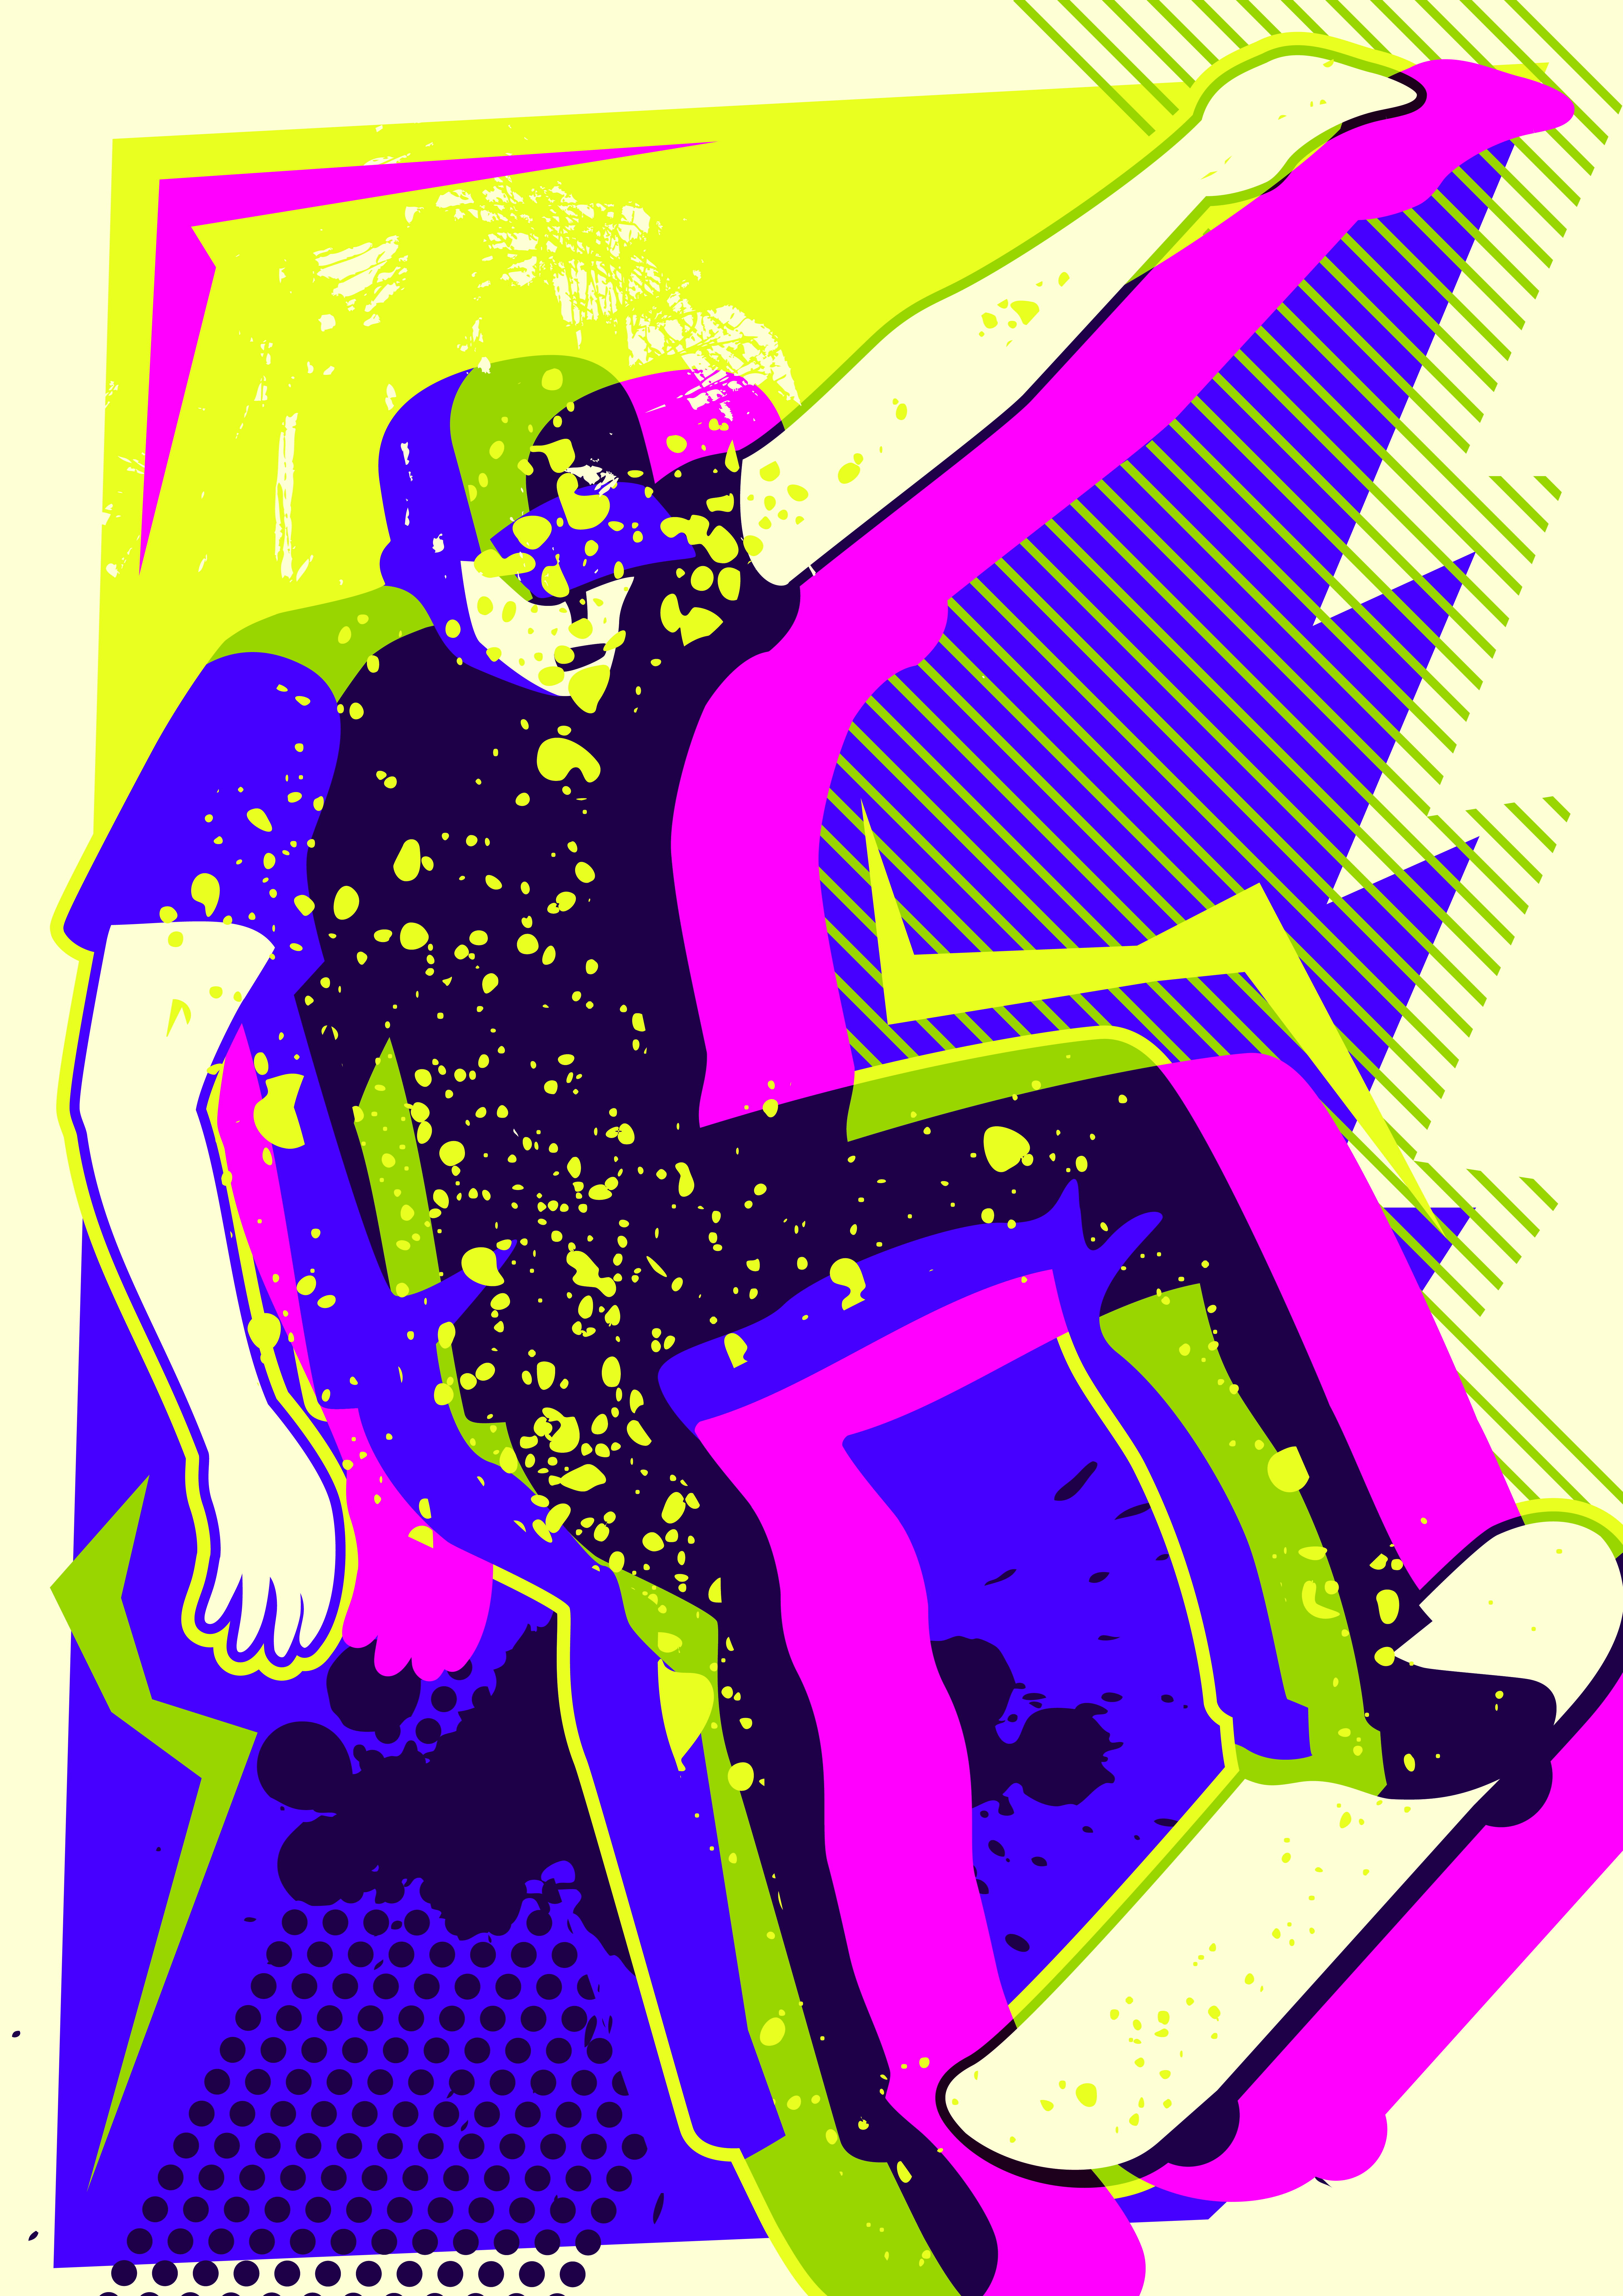 Roller Skate Sneakers >> Skateboard Pop Art - Download Free Vectors, Clipart ...